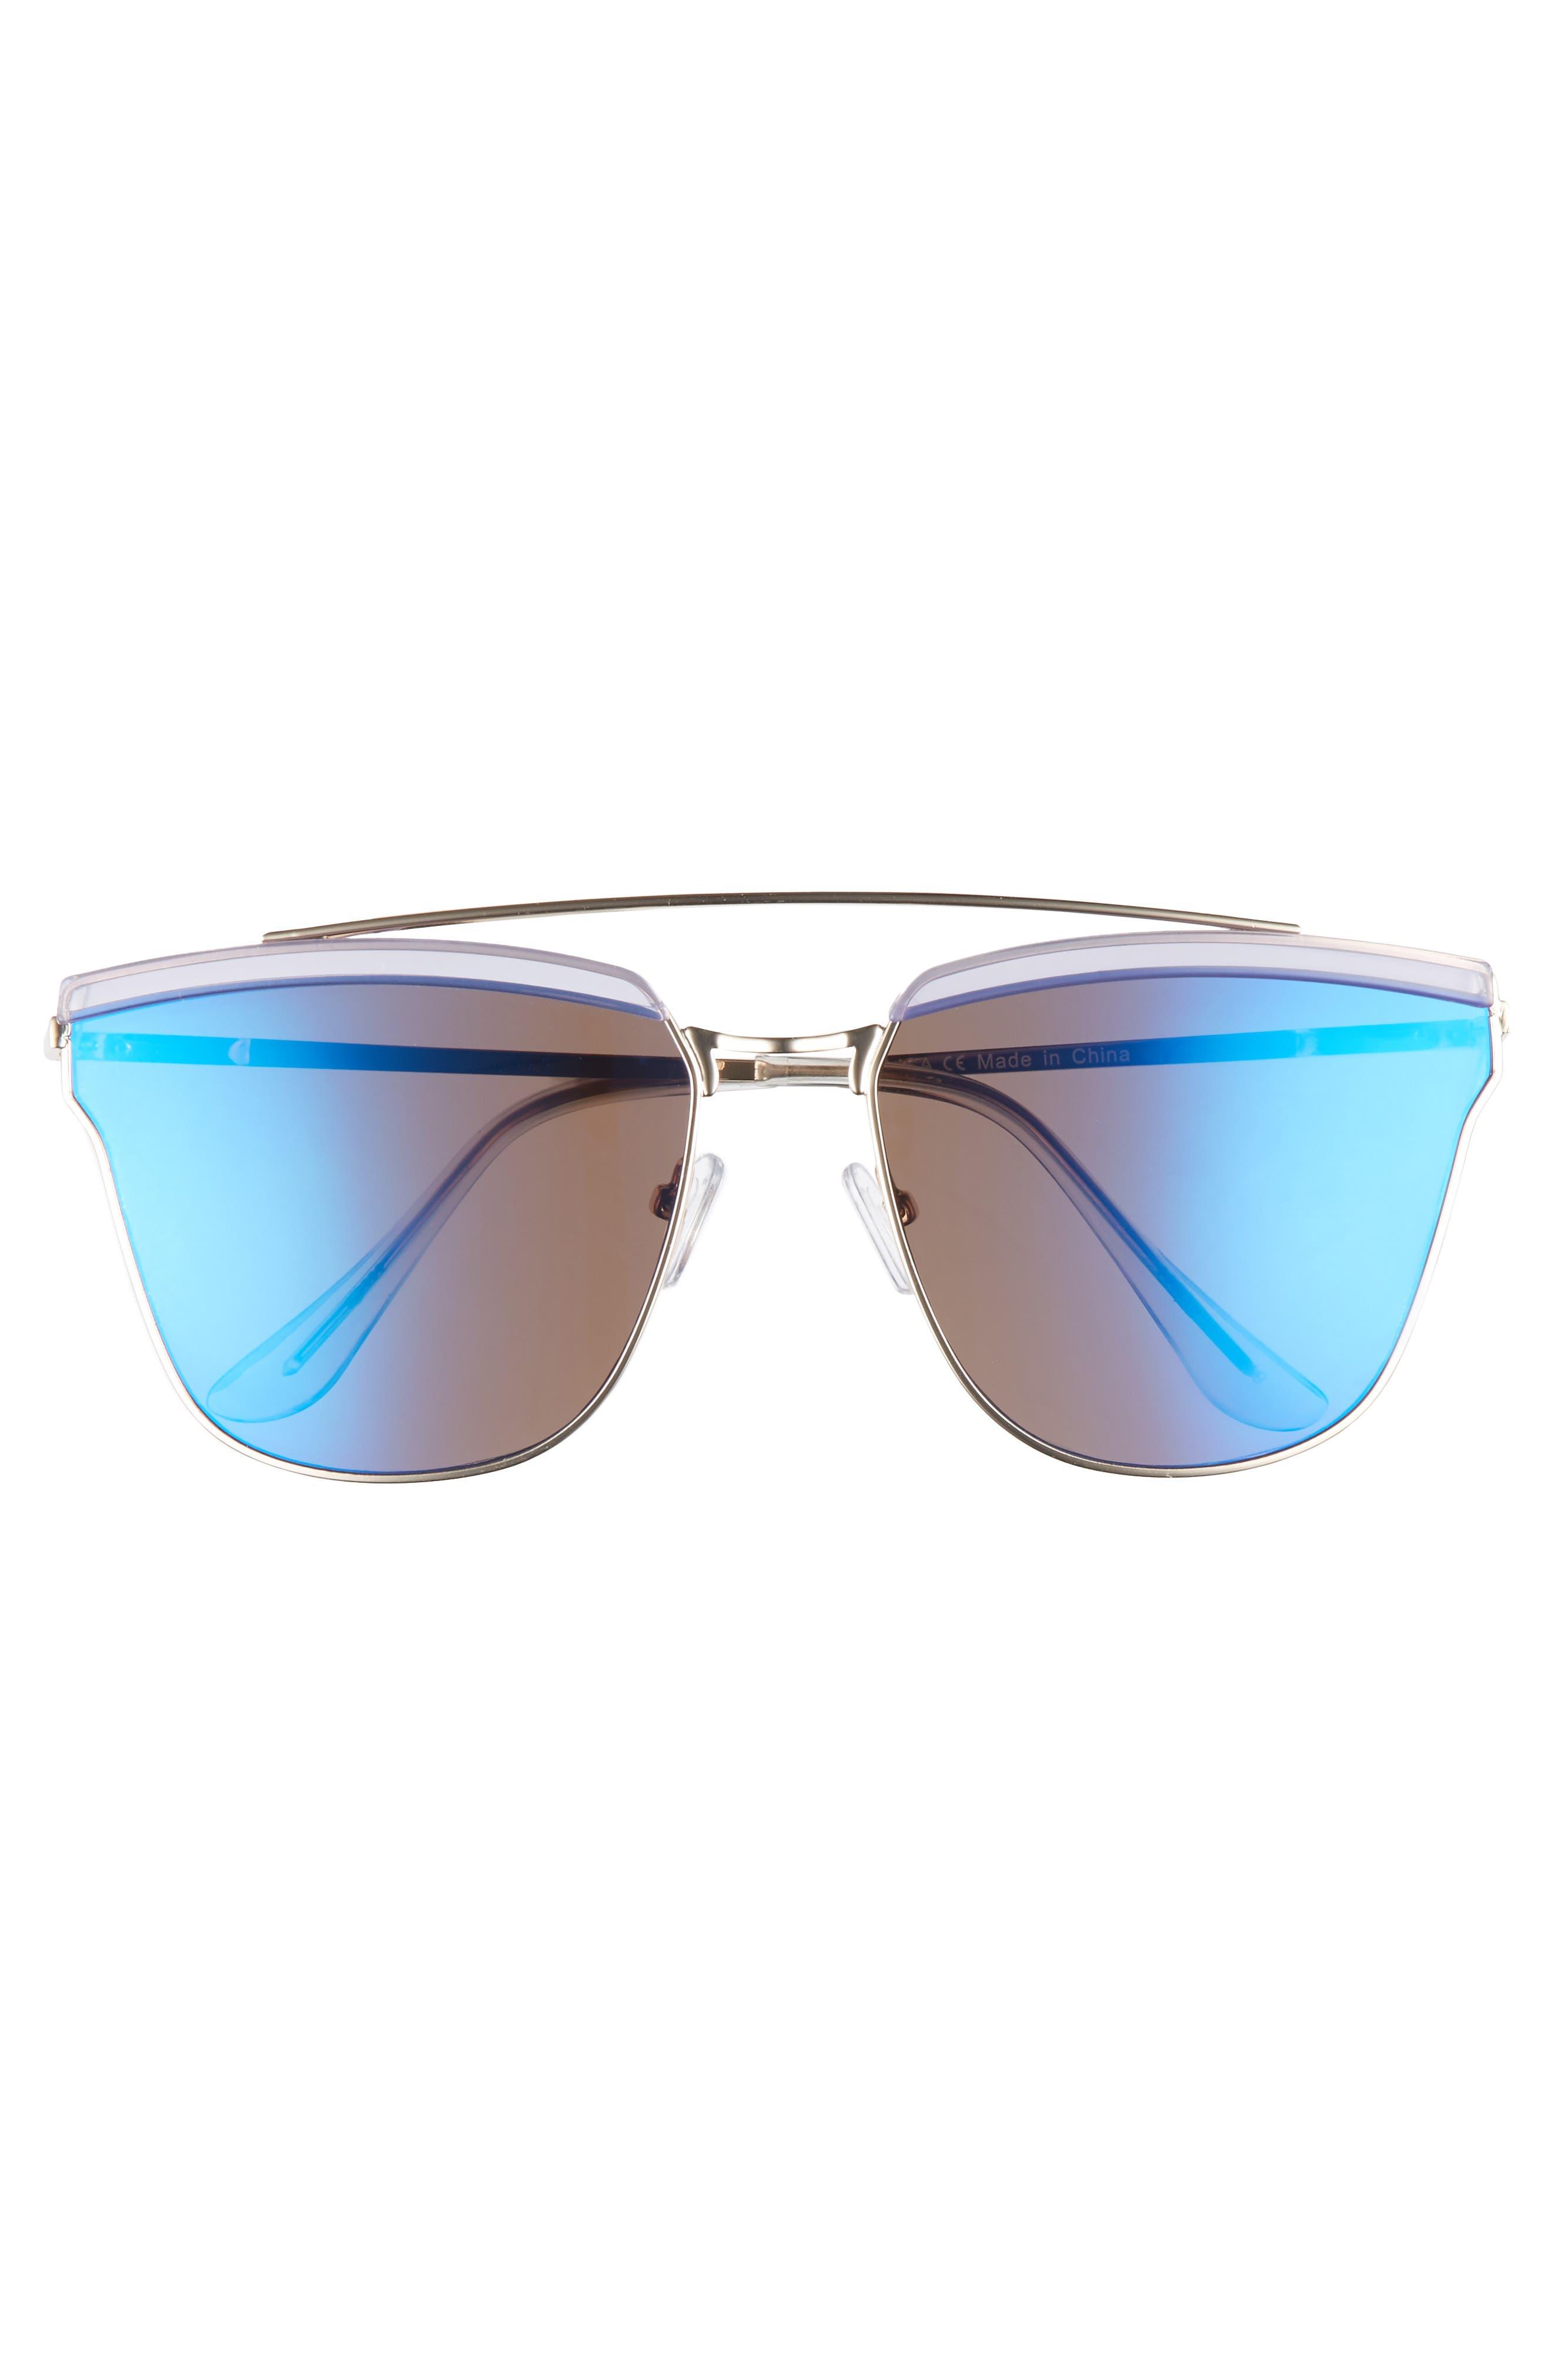 60mm Mirror Sunglasses,                             Alternate thumbnail 3, color,                             712